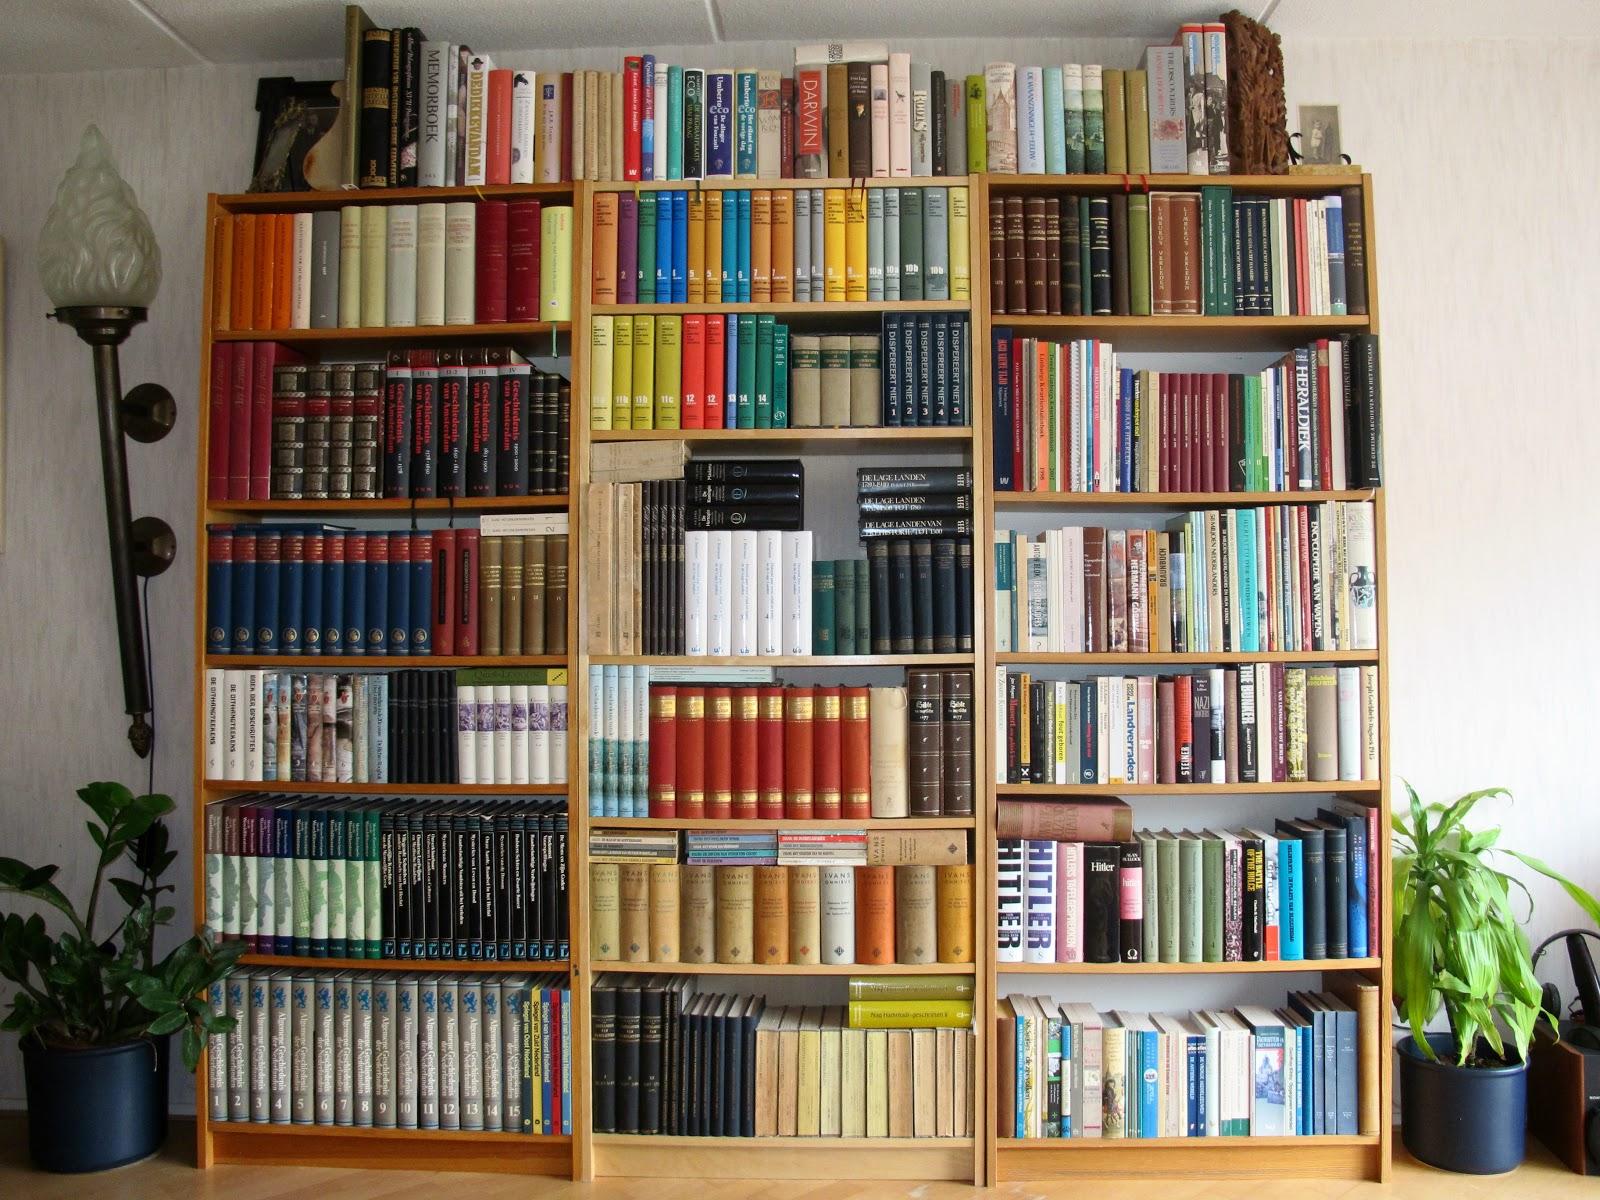 P e r k a m e n t u s: Over mijn bibliotheek